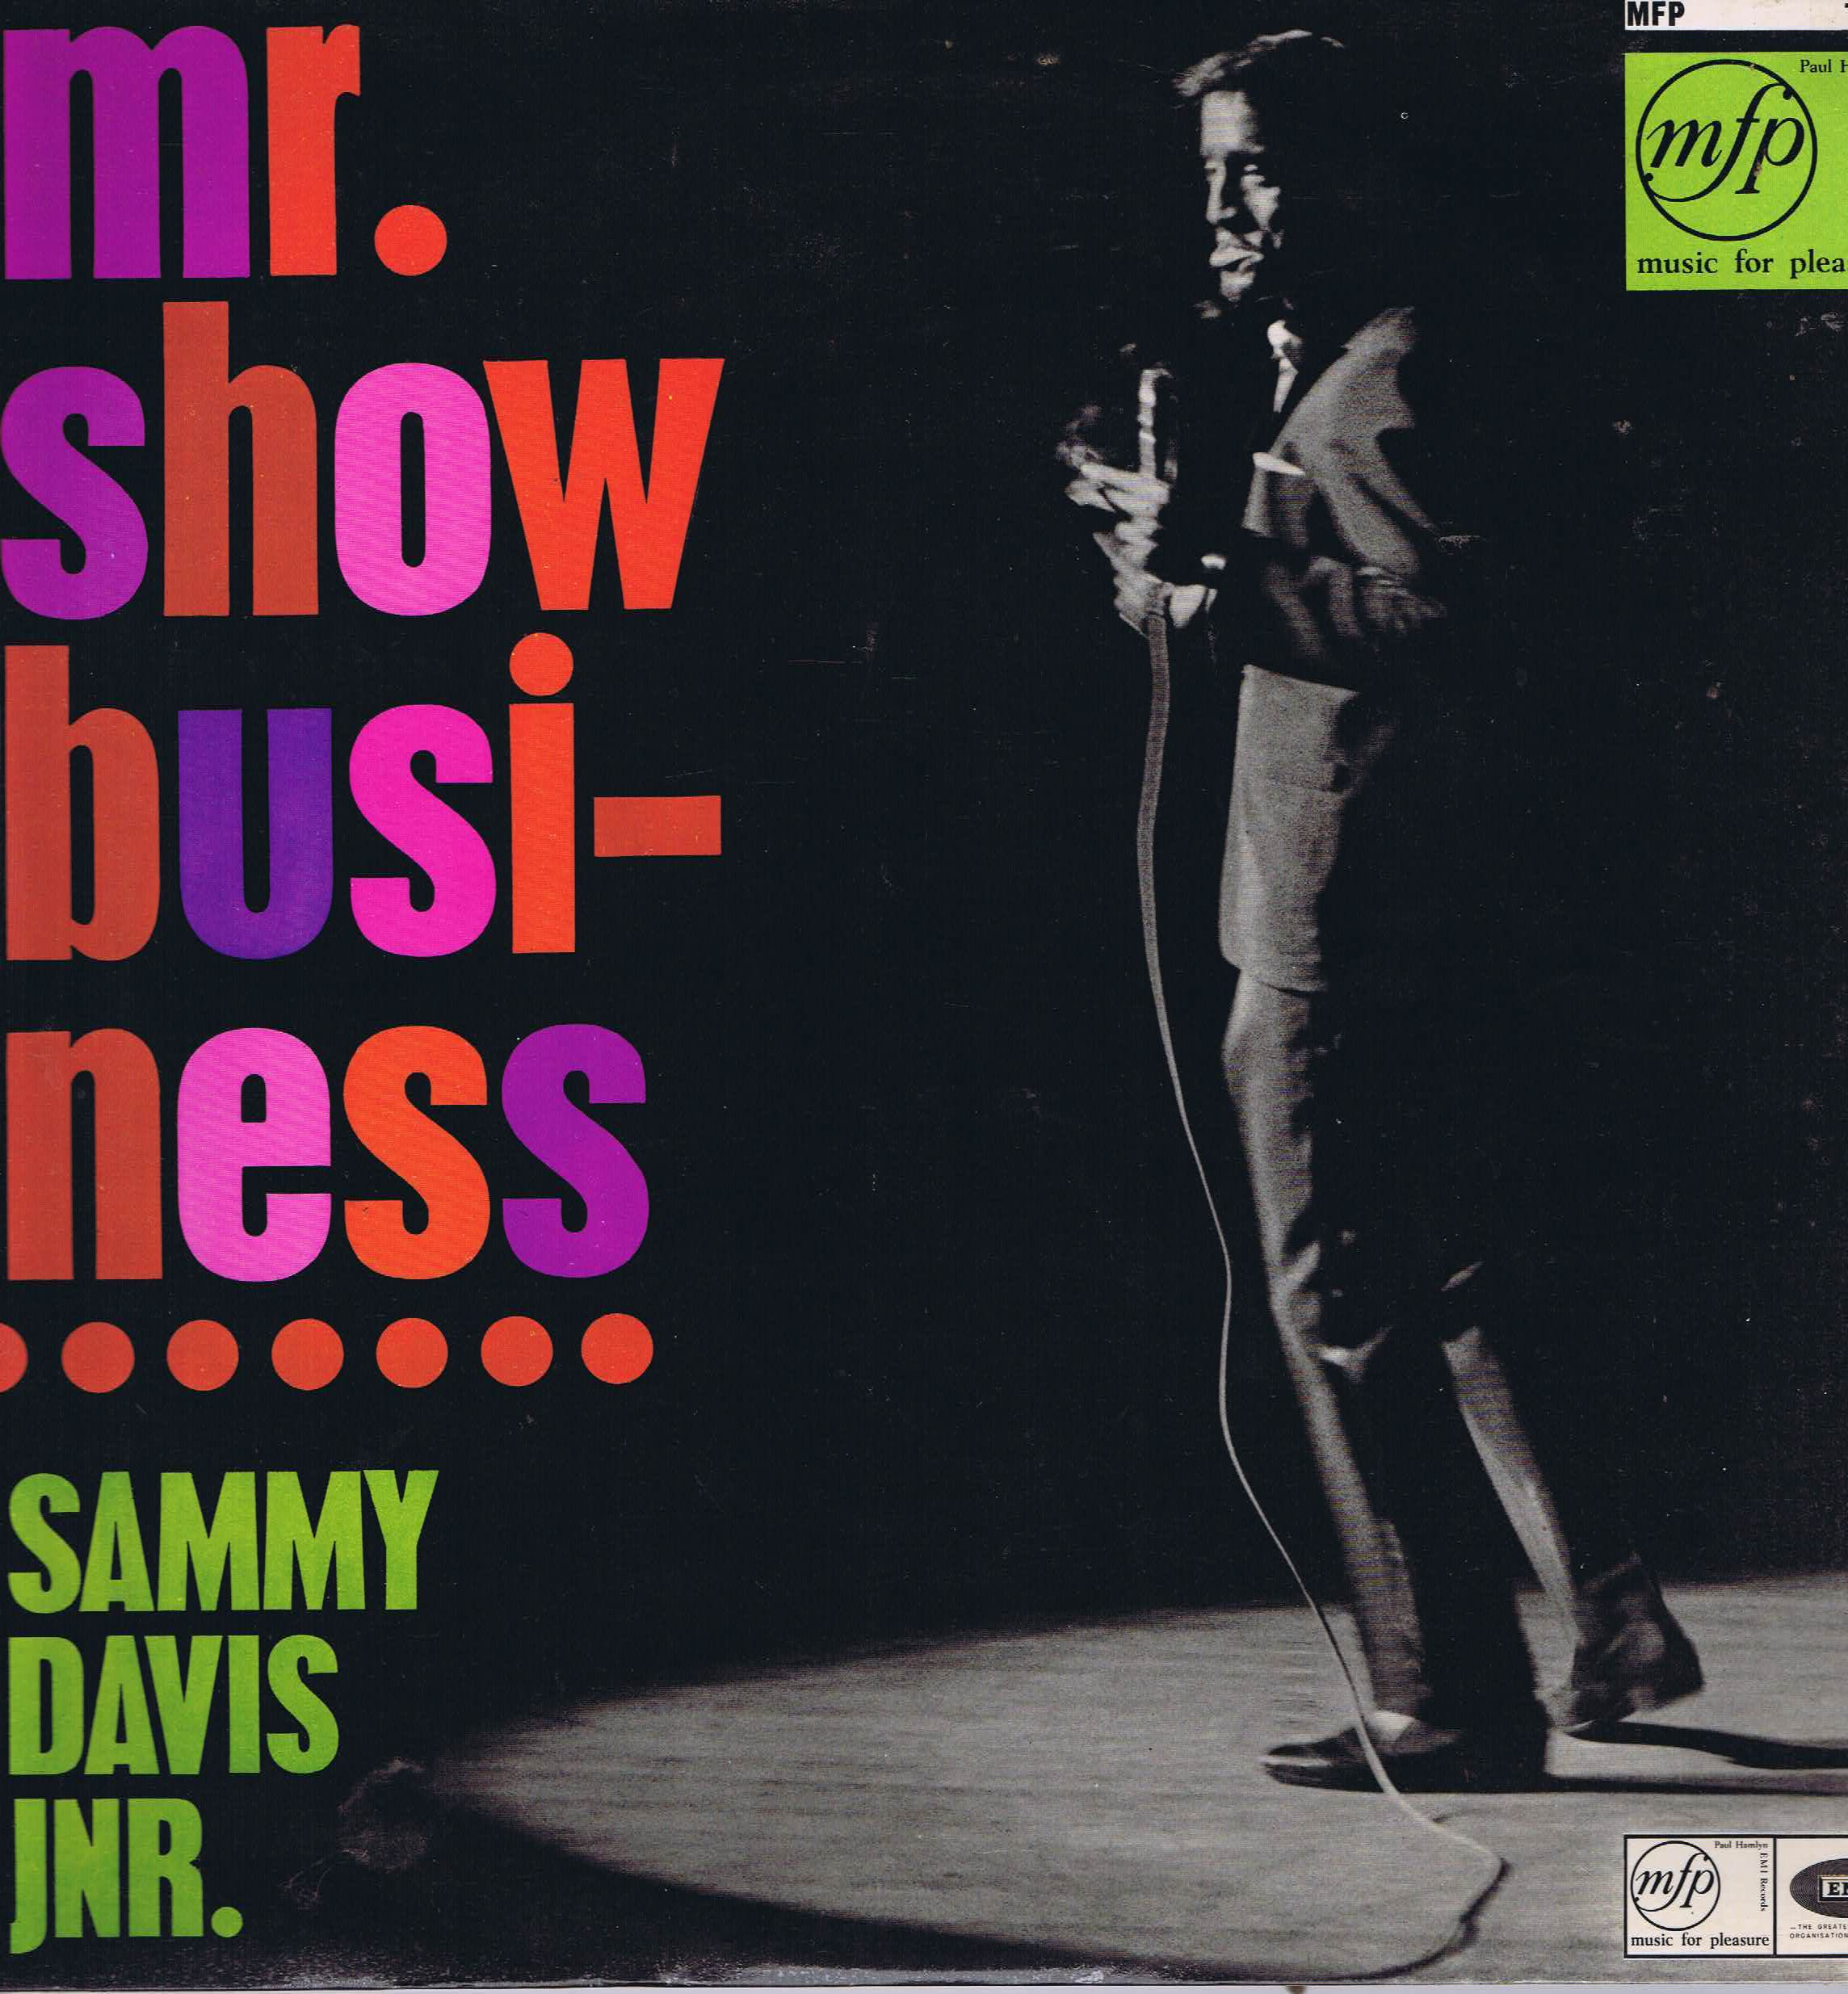 Sammy Davis Jr. Mr Show-Business